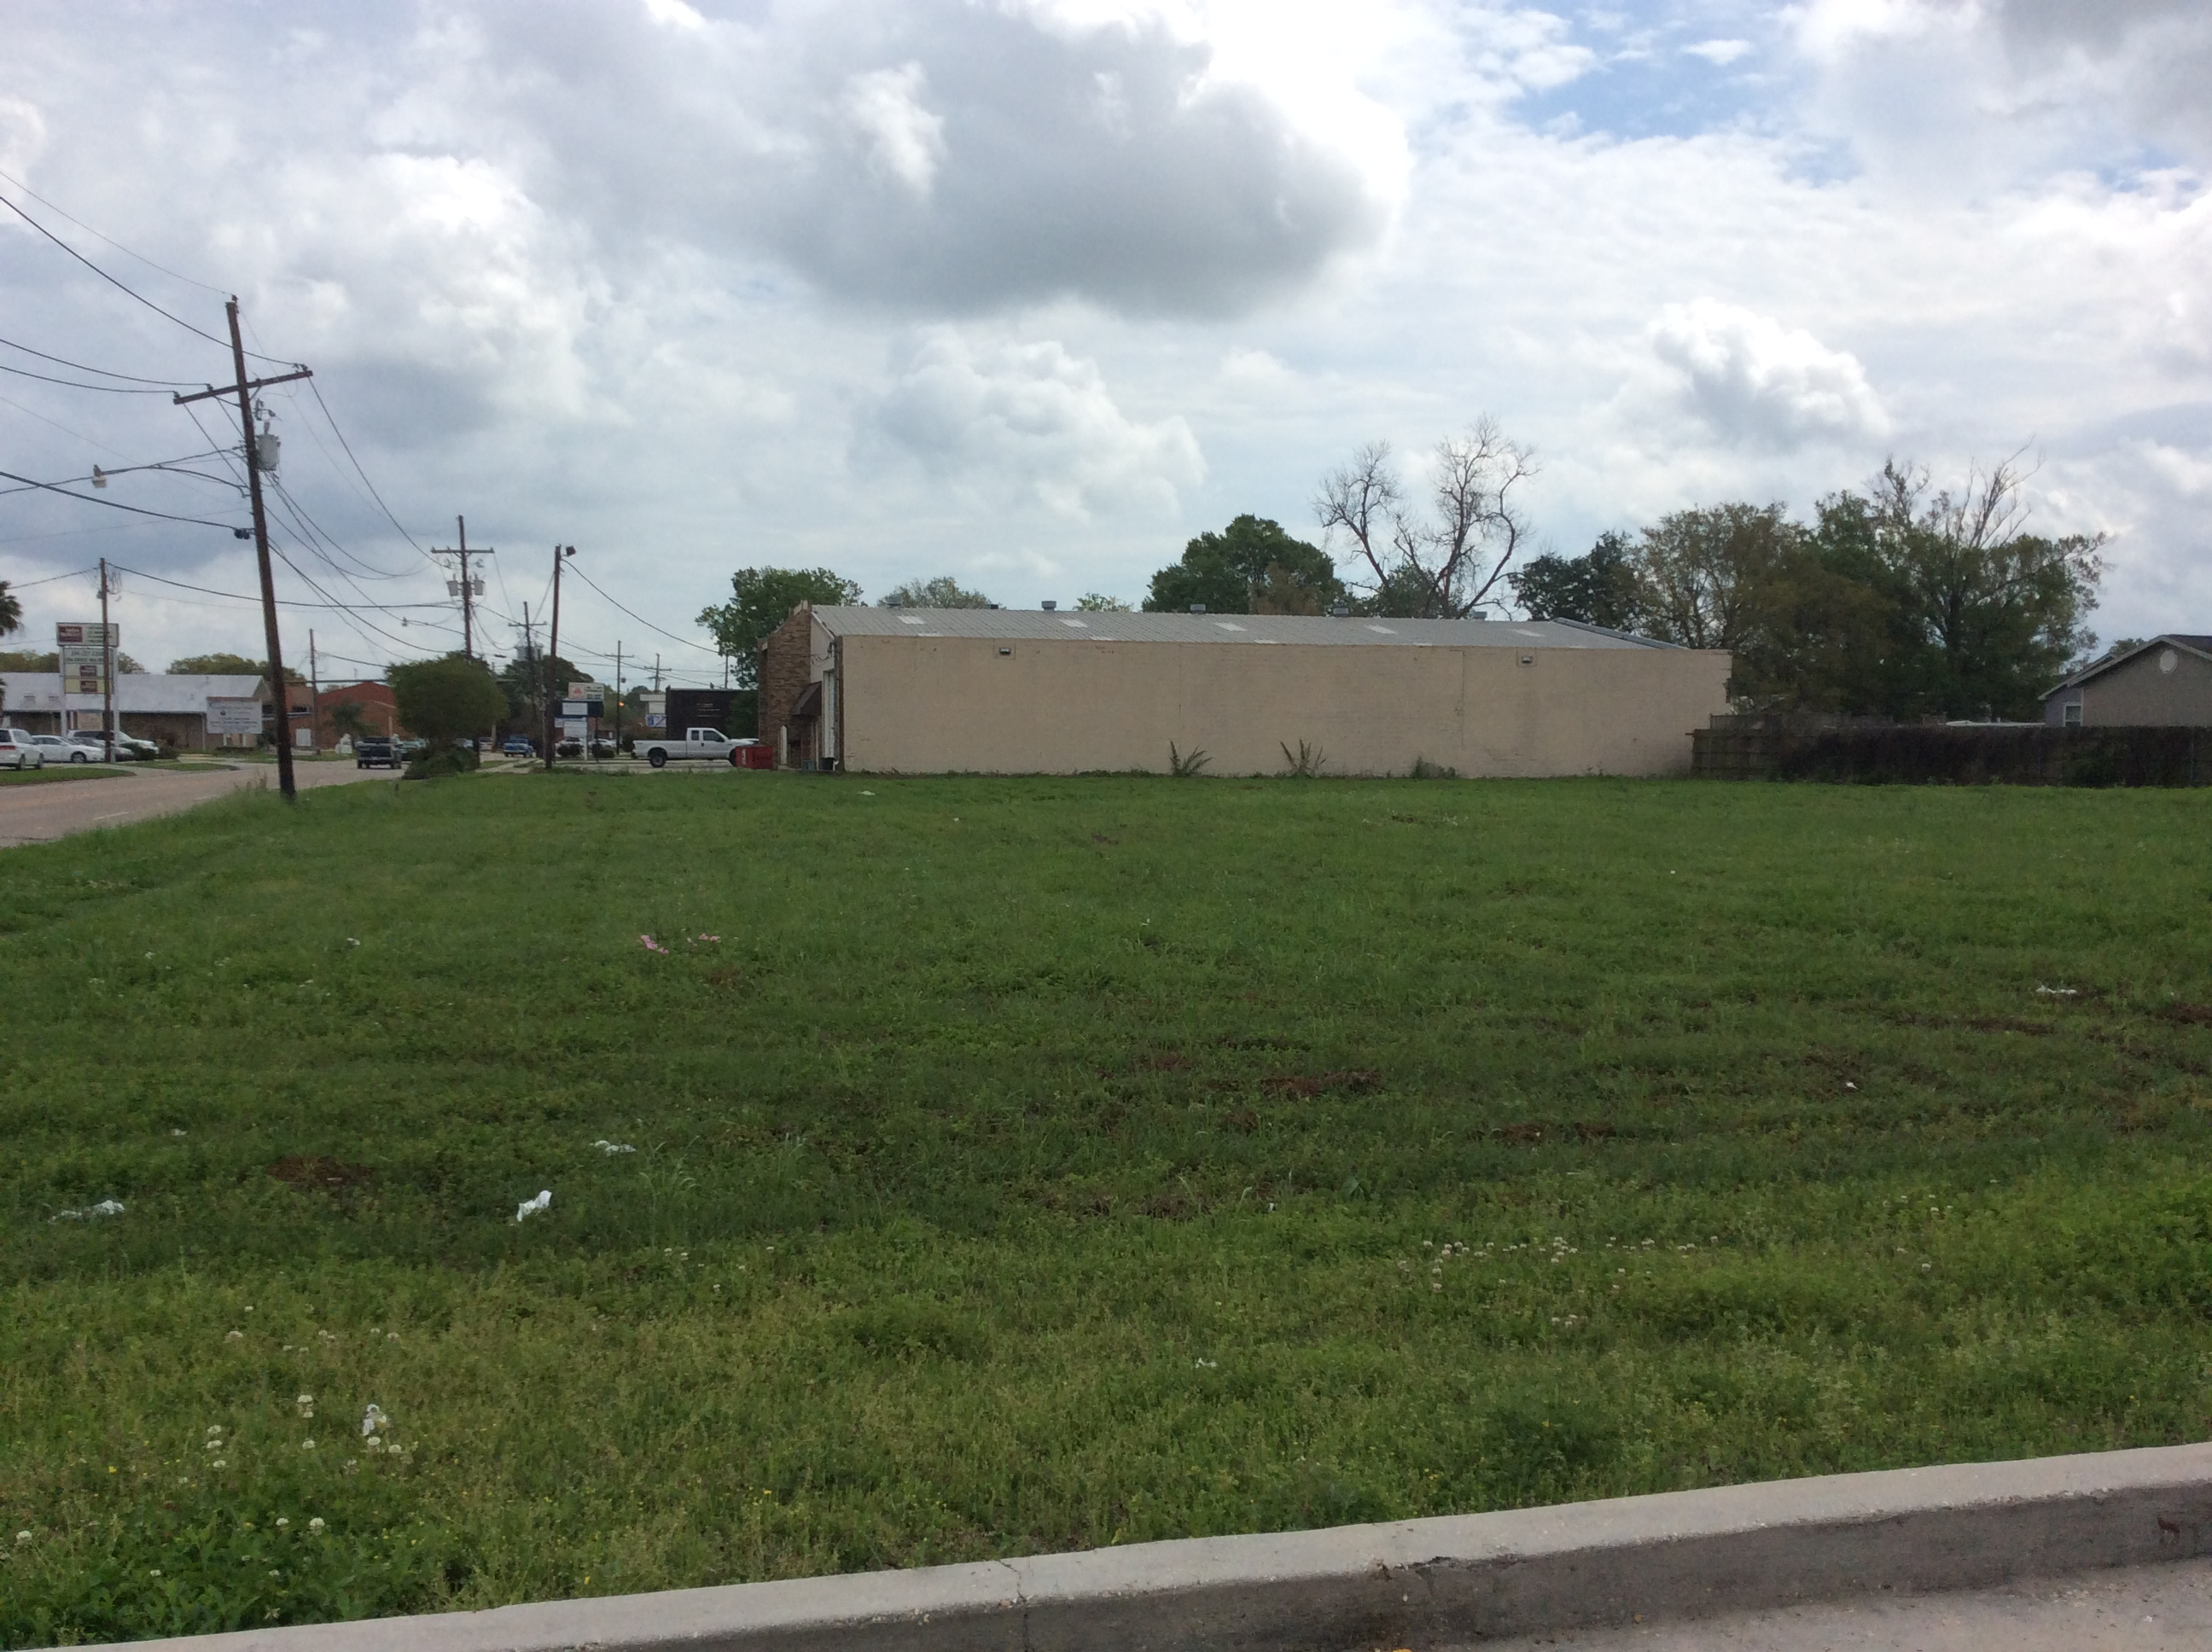 1720 STUMPF BLVD., Gretna, Louisiana 70056